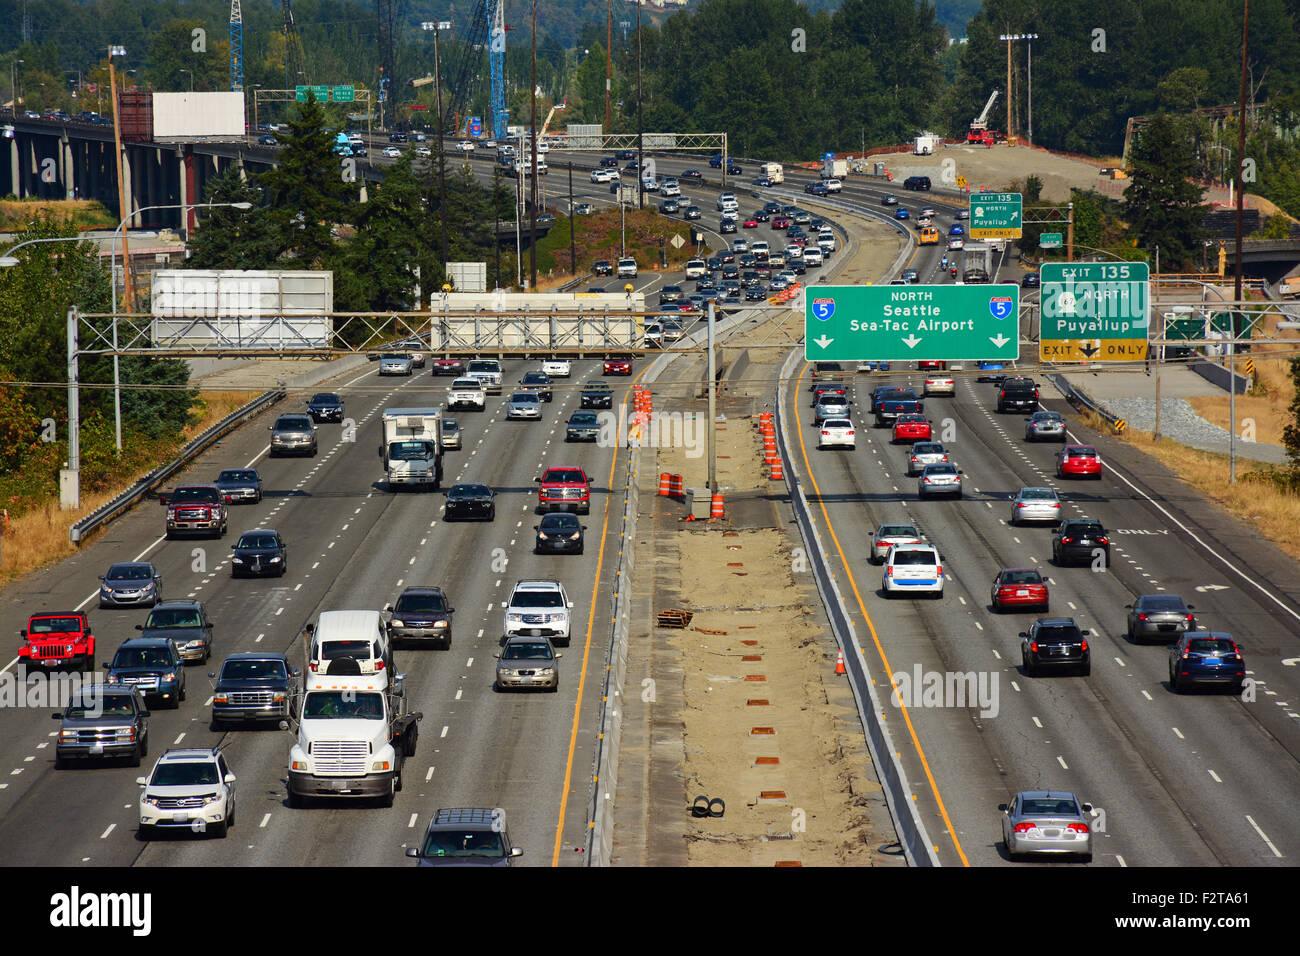 Highway 5 in Washington state, USA - Stock Image